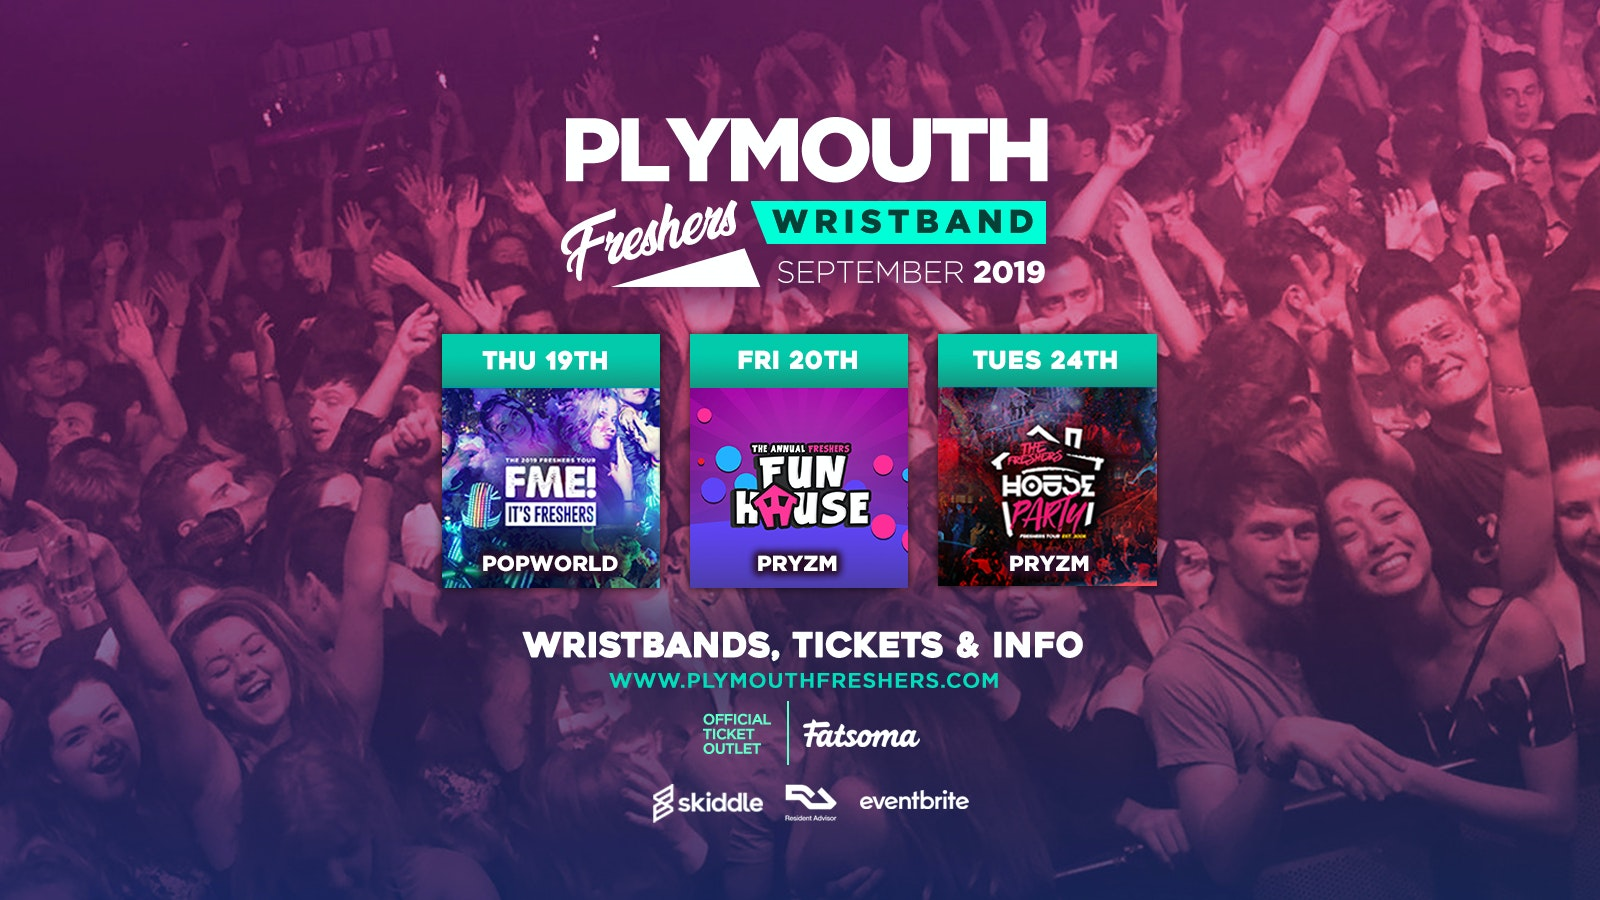 Plymouth Freshers Wristband 2019 ///